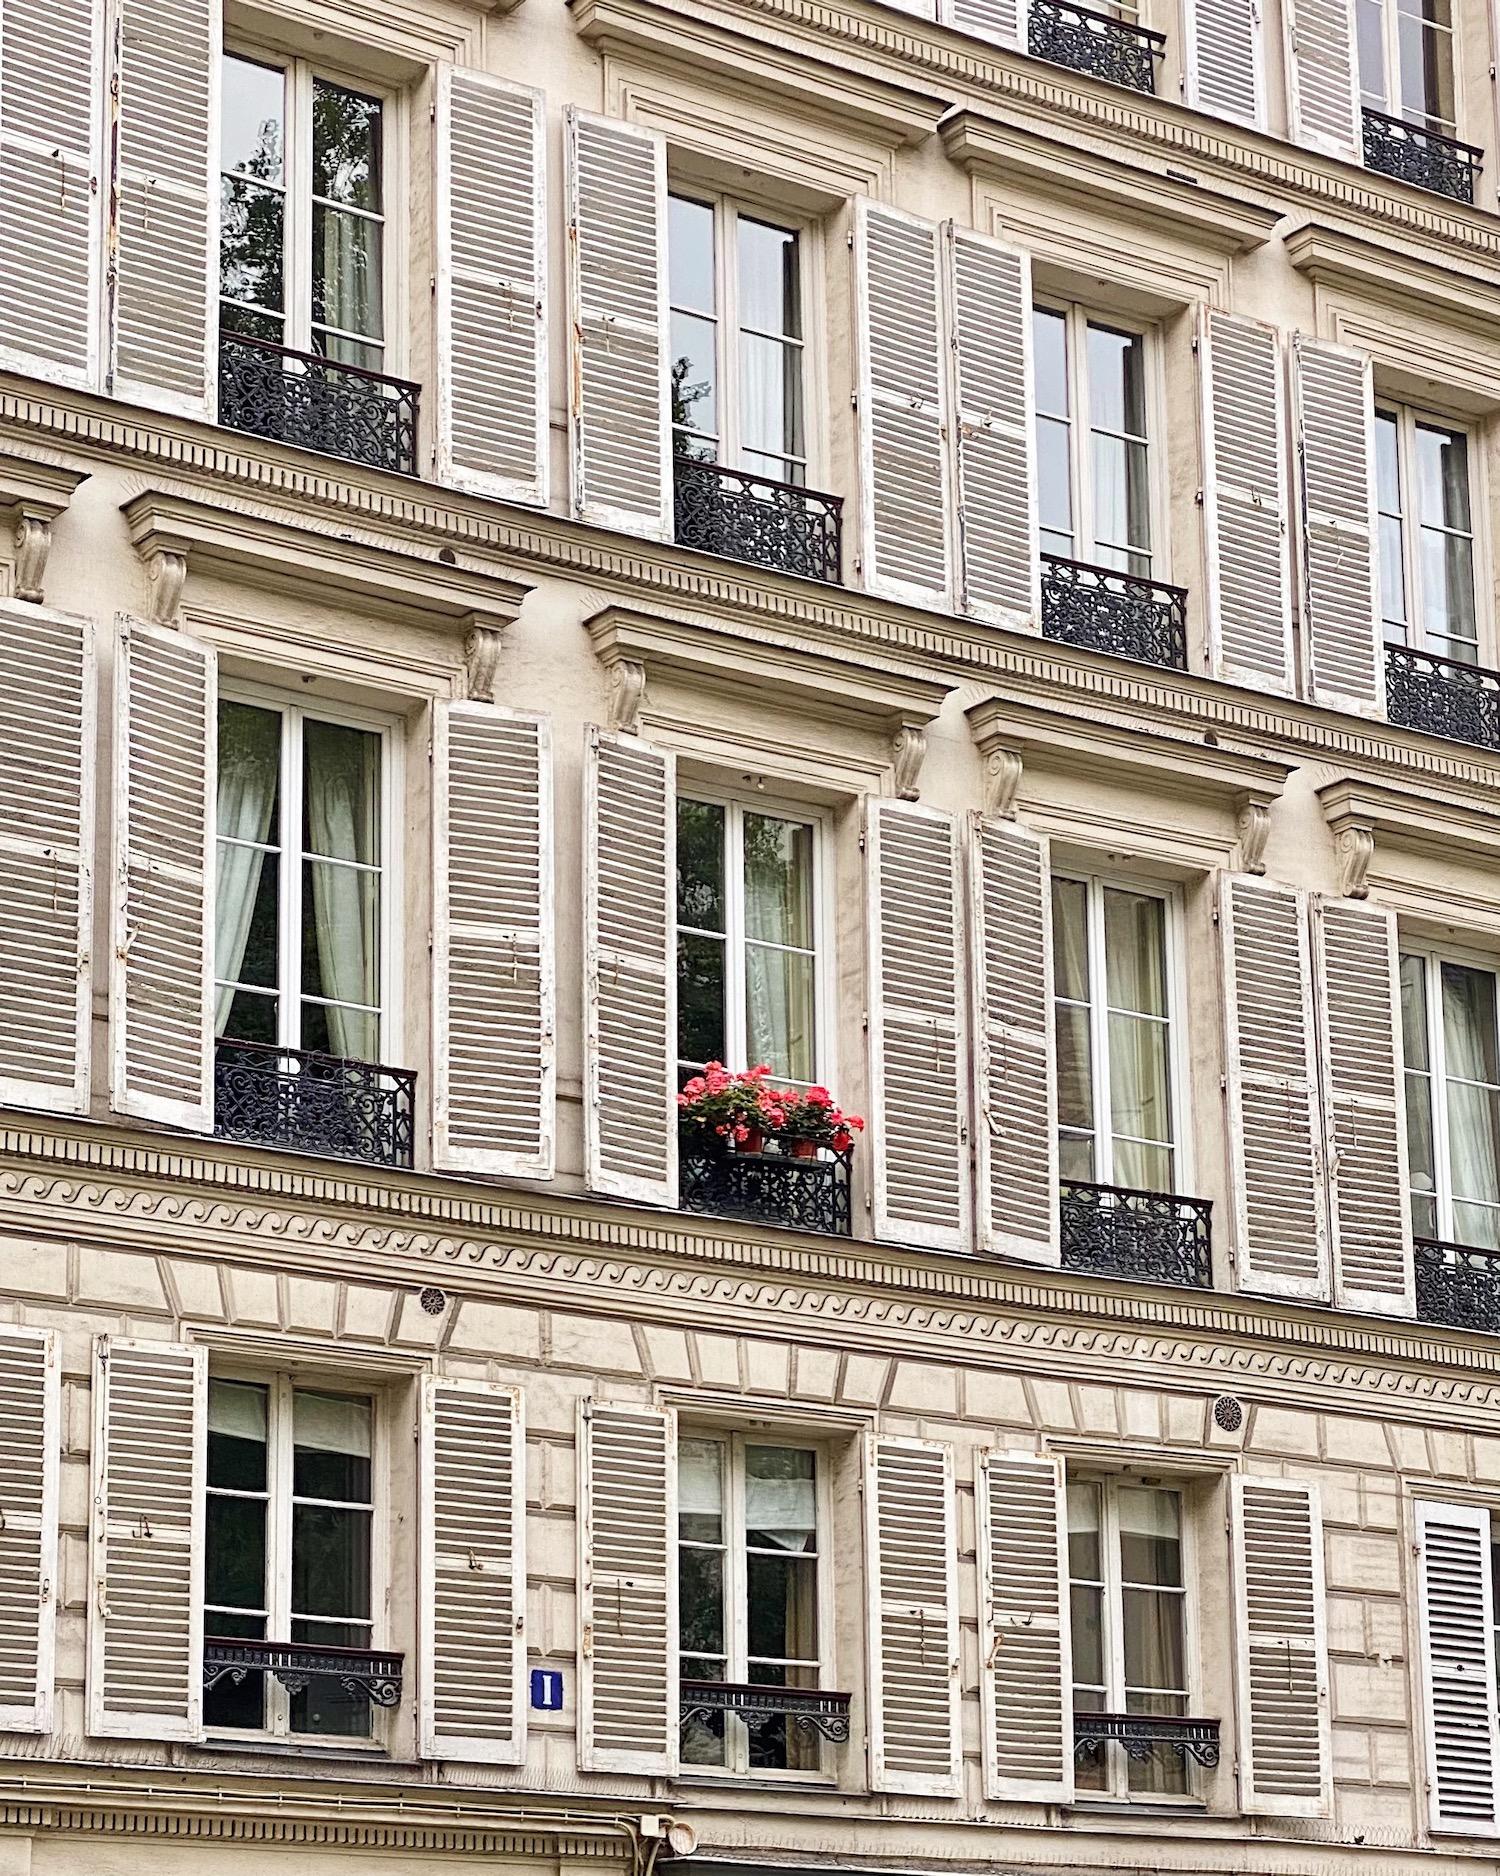 rue jacob apartment